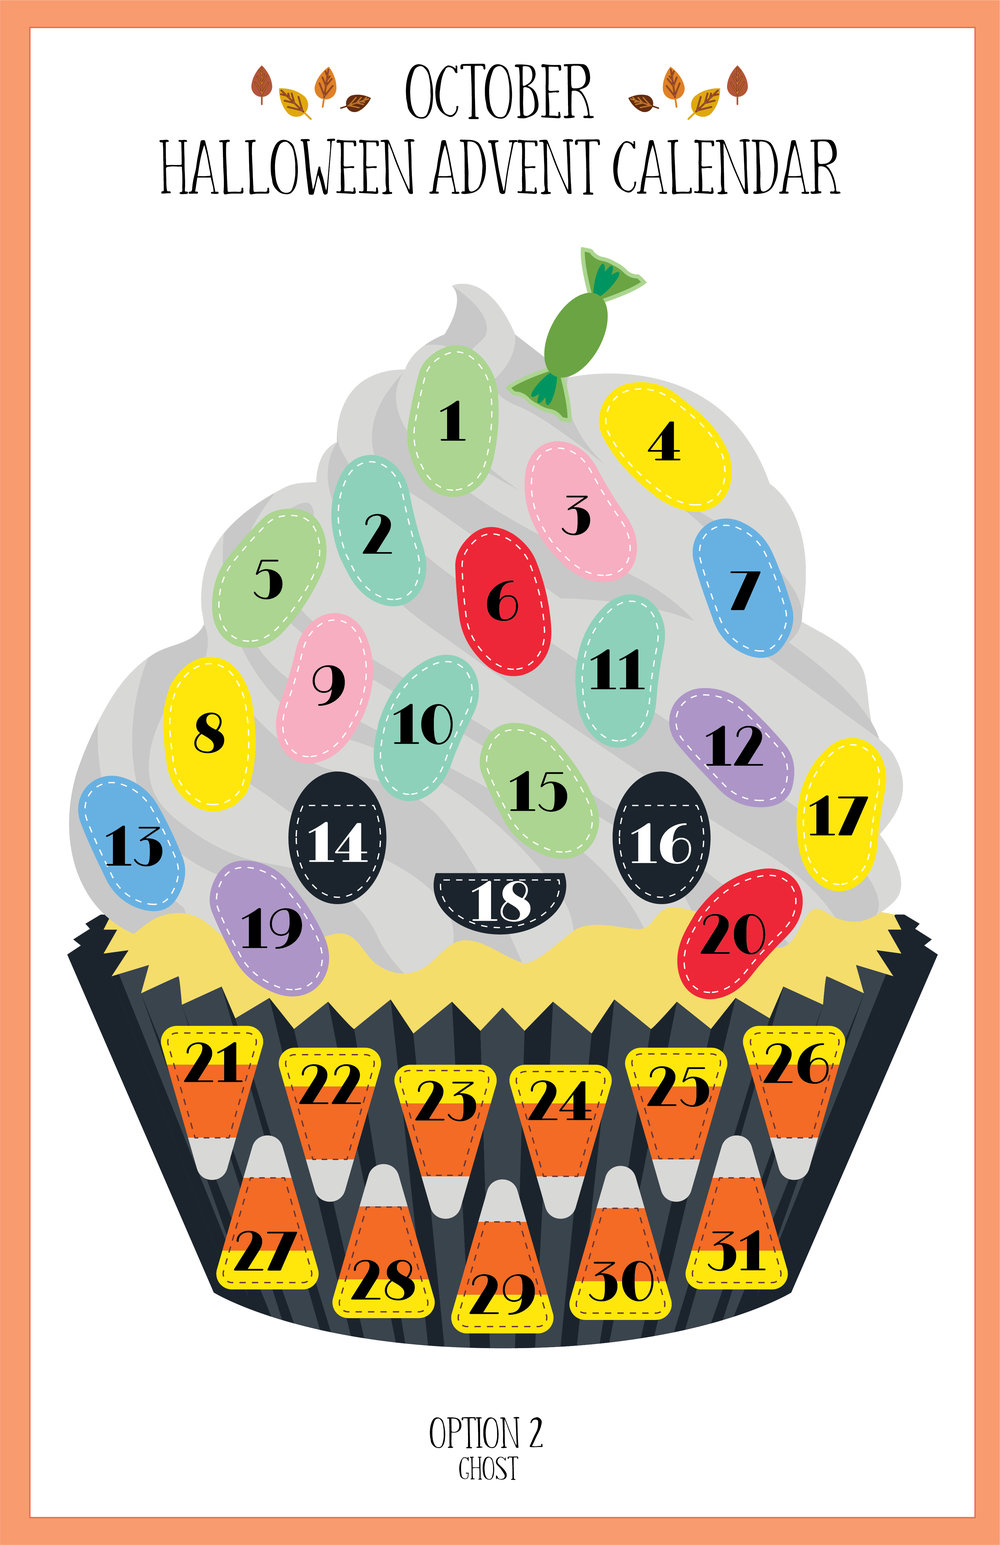 October 2018 Halloween Ghost Cupcake Advent Calendar